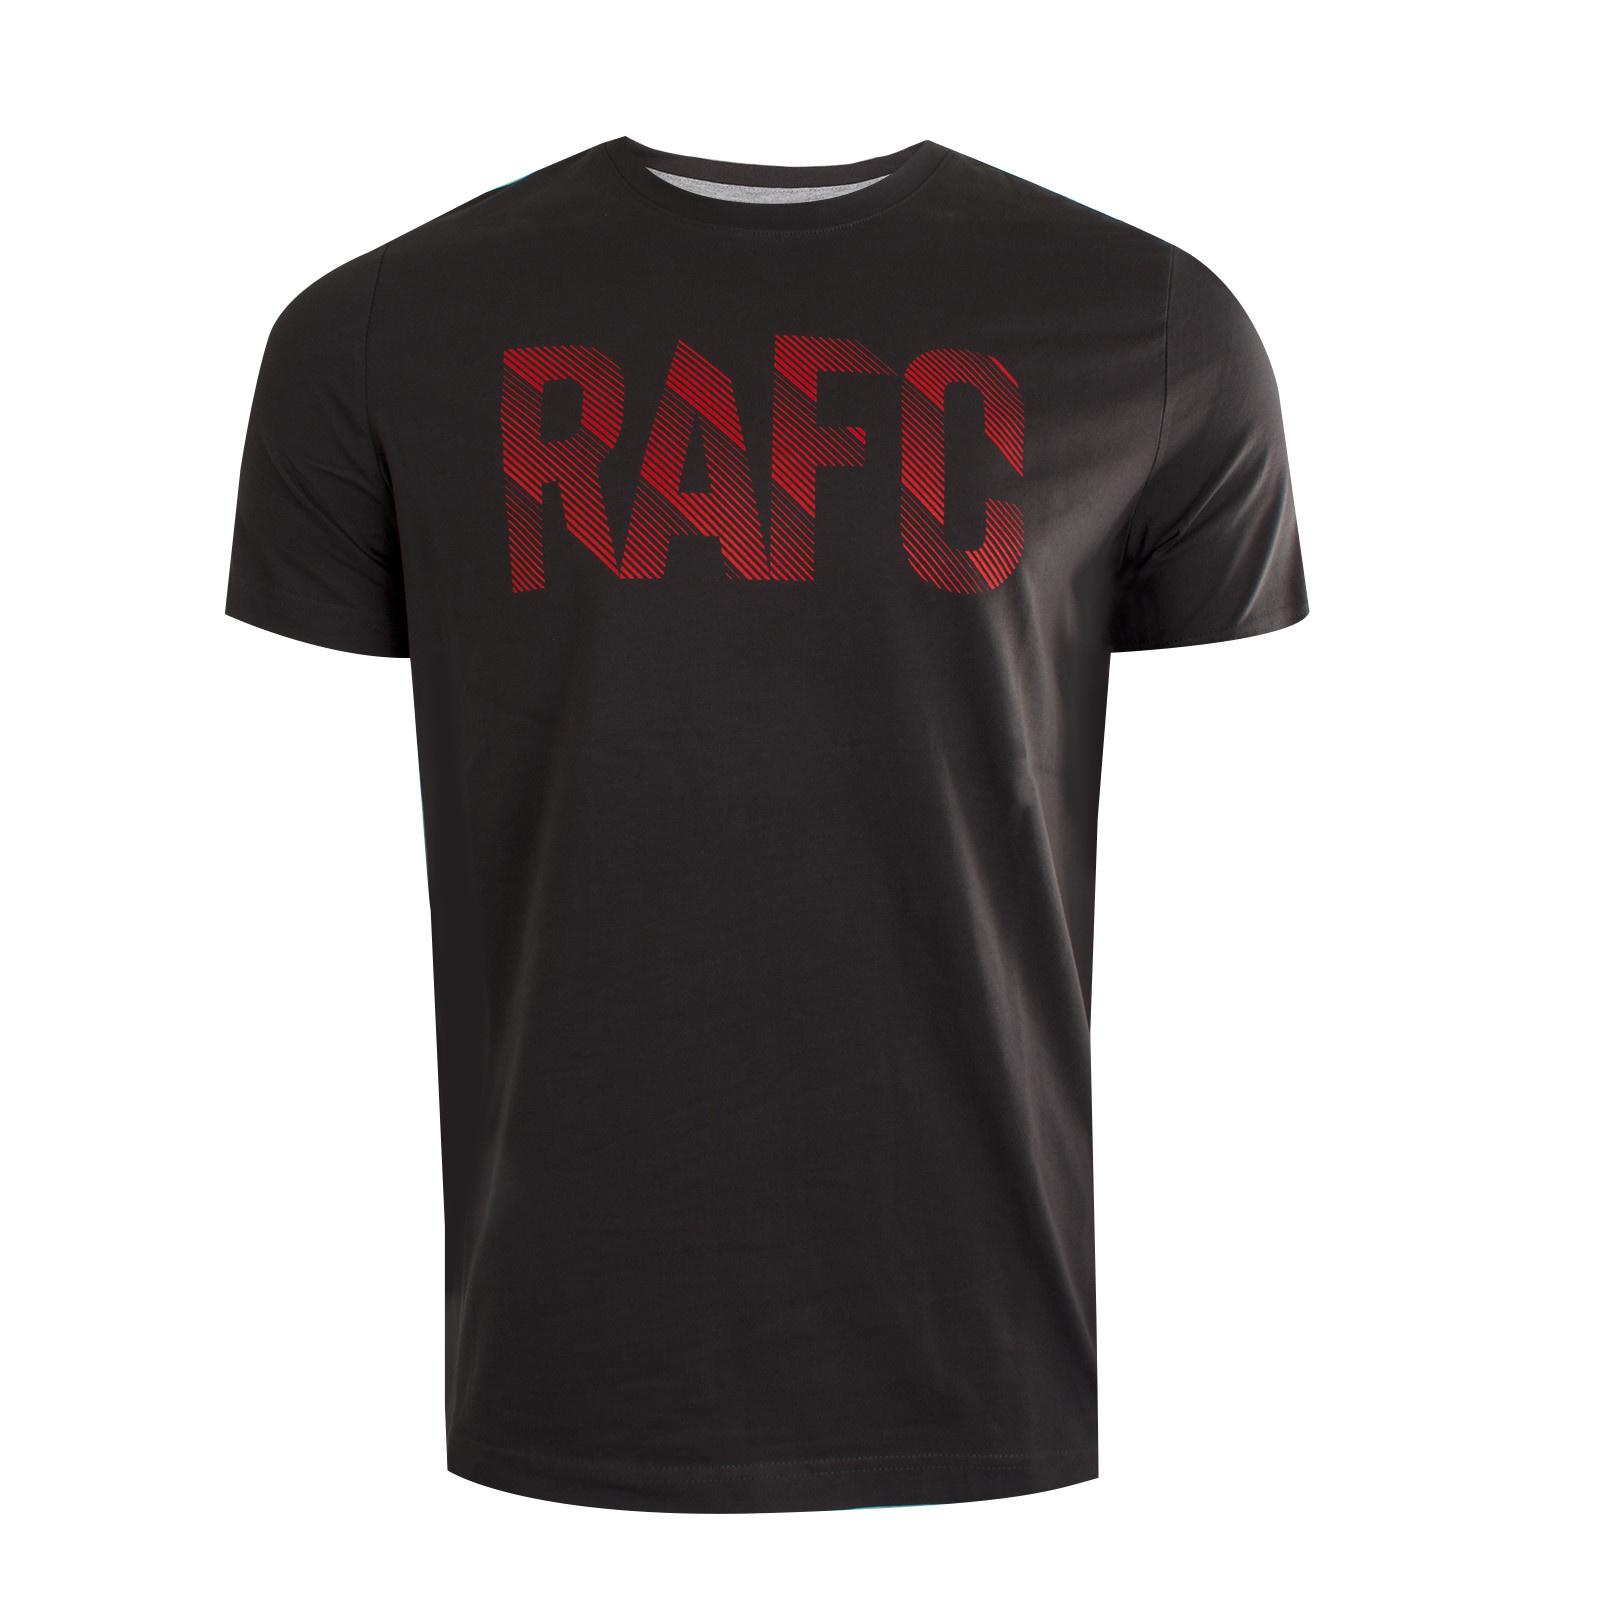 RAFC T-shirt Dark Grey-1